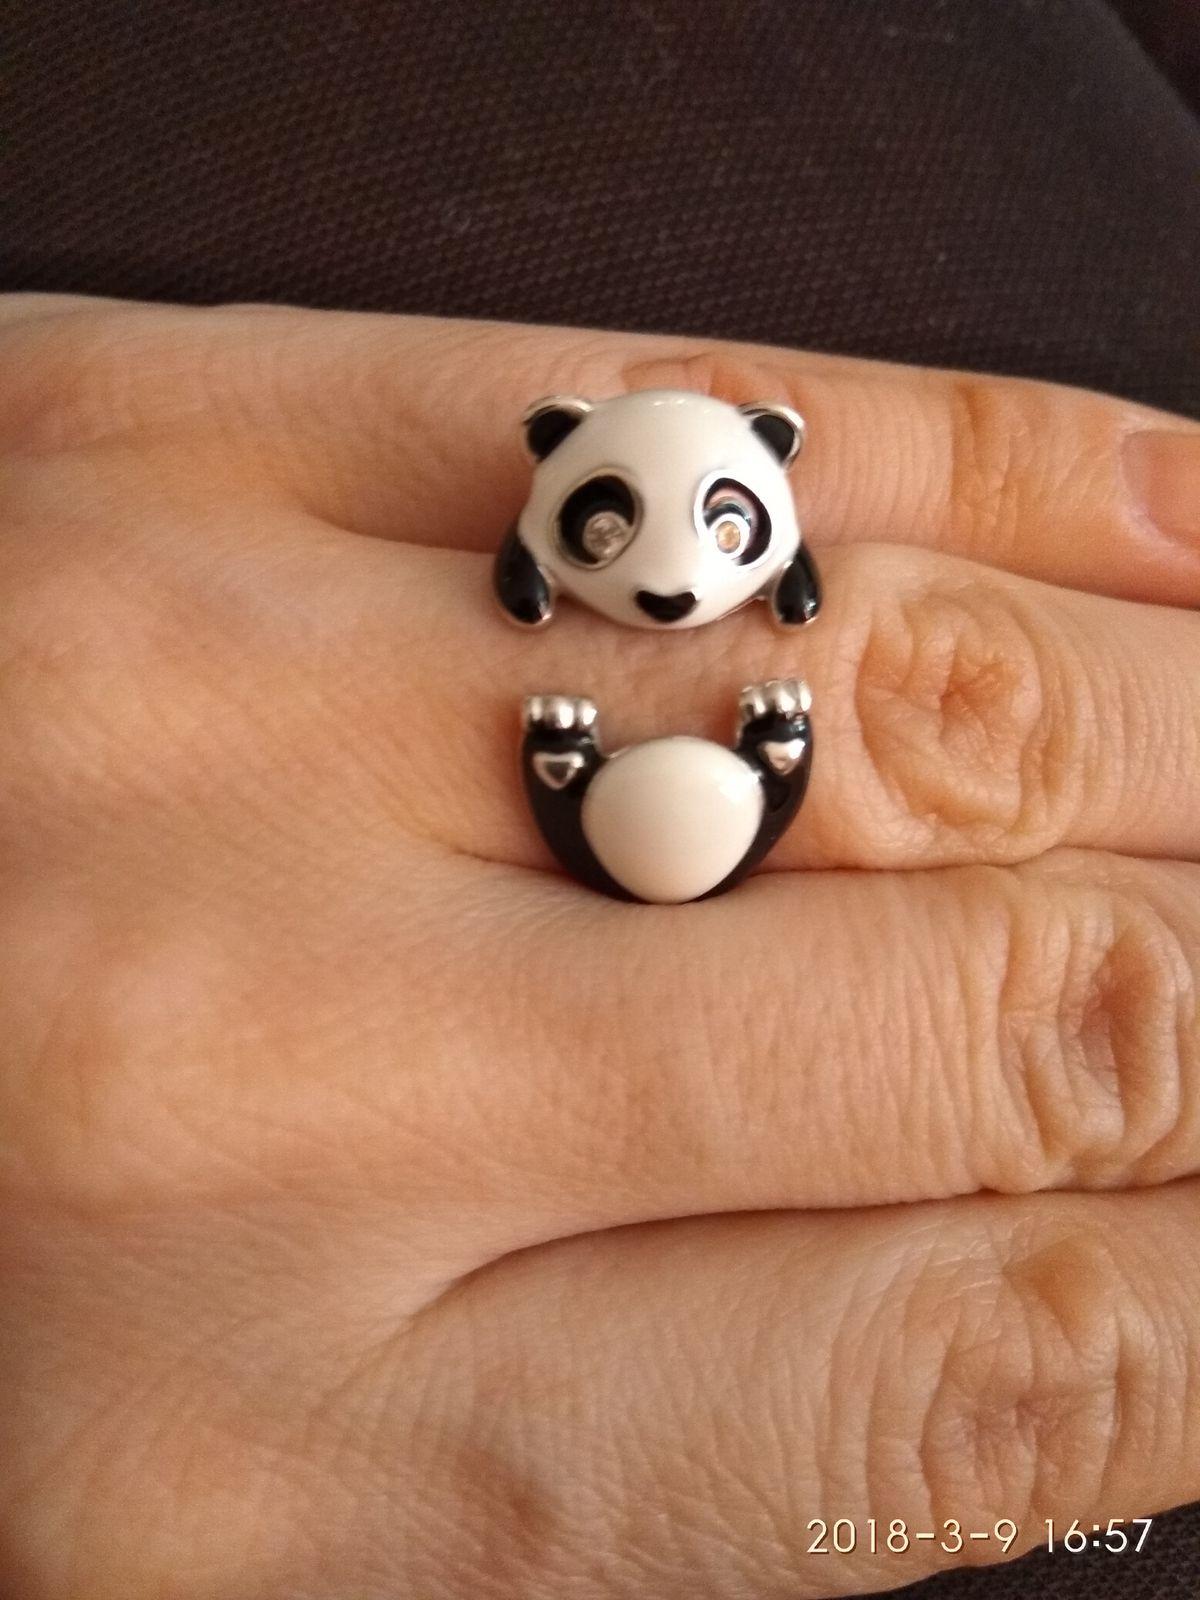 Симпатичный панда